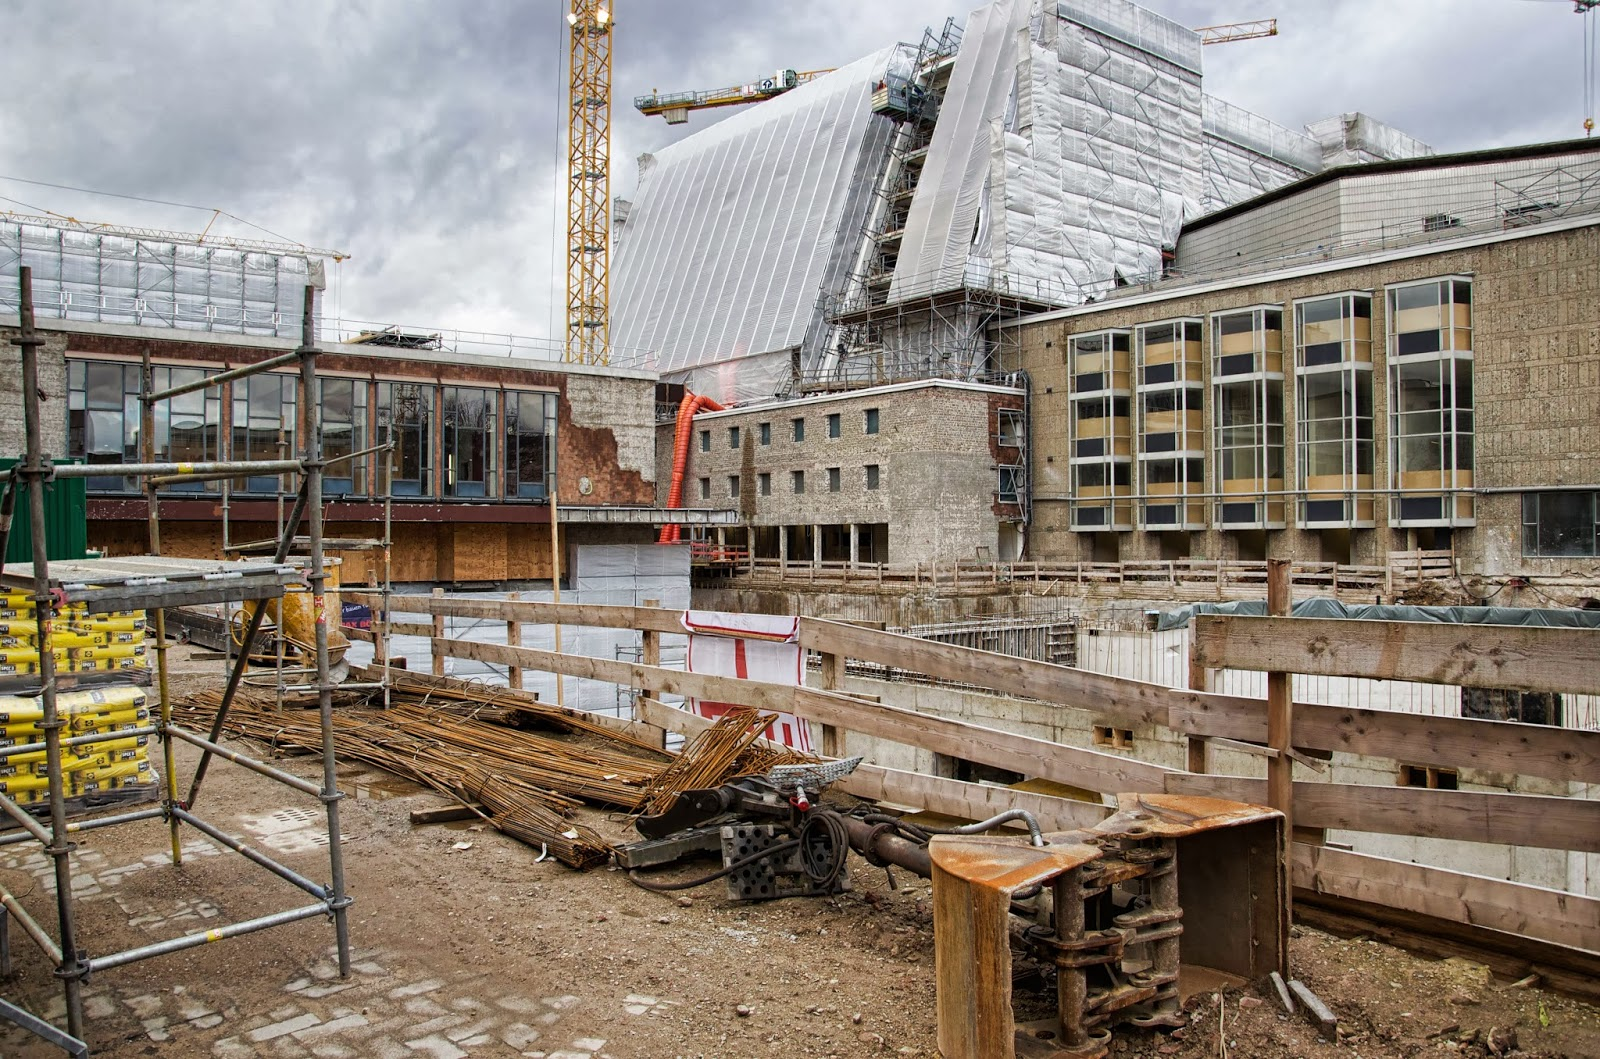 Berliner Baustellen: 0257, Baustelle Köln, Bühnen